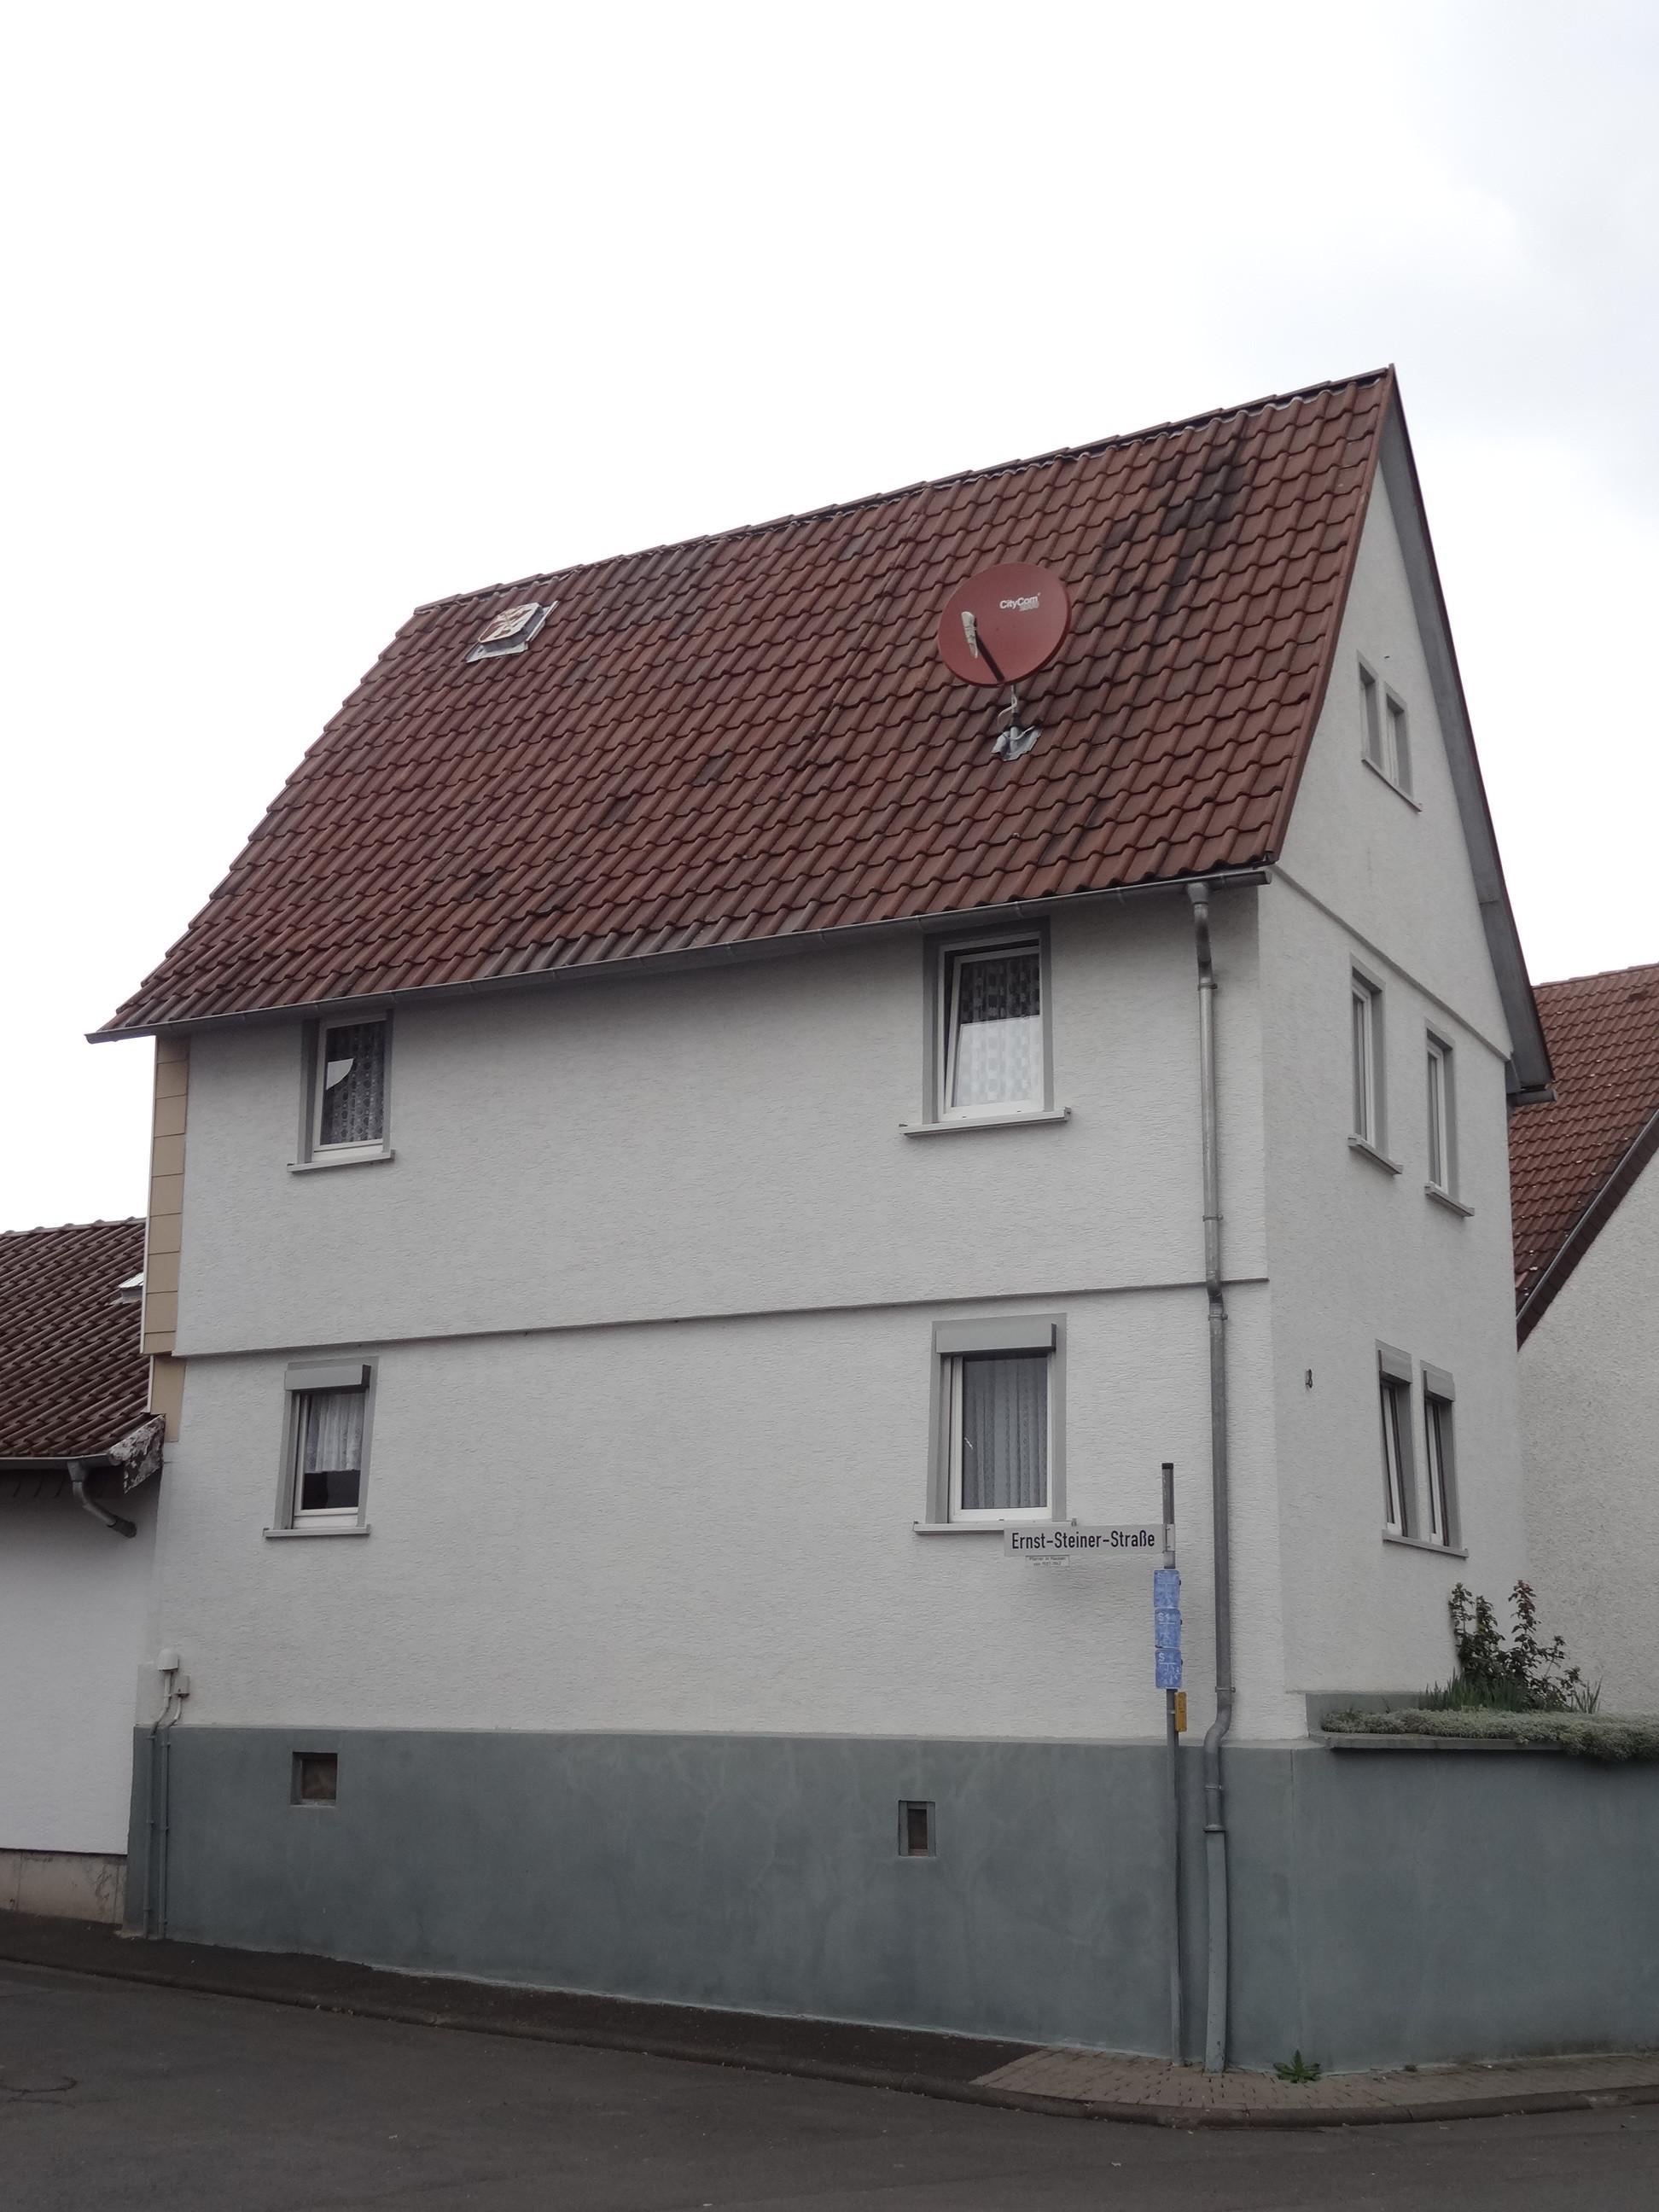 Pohlheim Hausen  File Bachstraße 8 Hausen Pohlheim 02 JPG Wikimedia